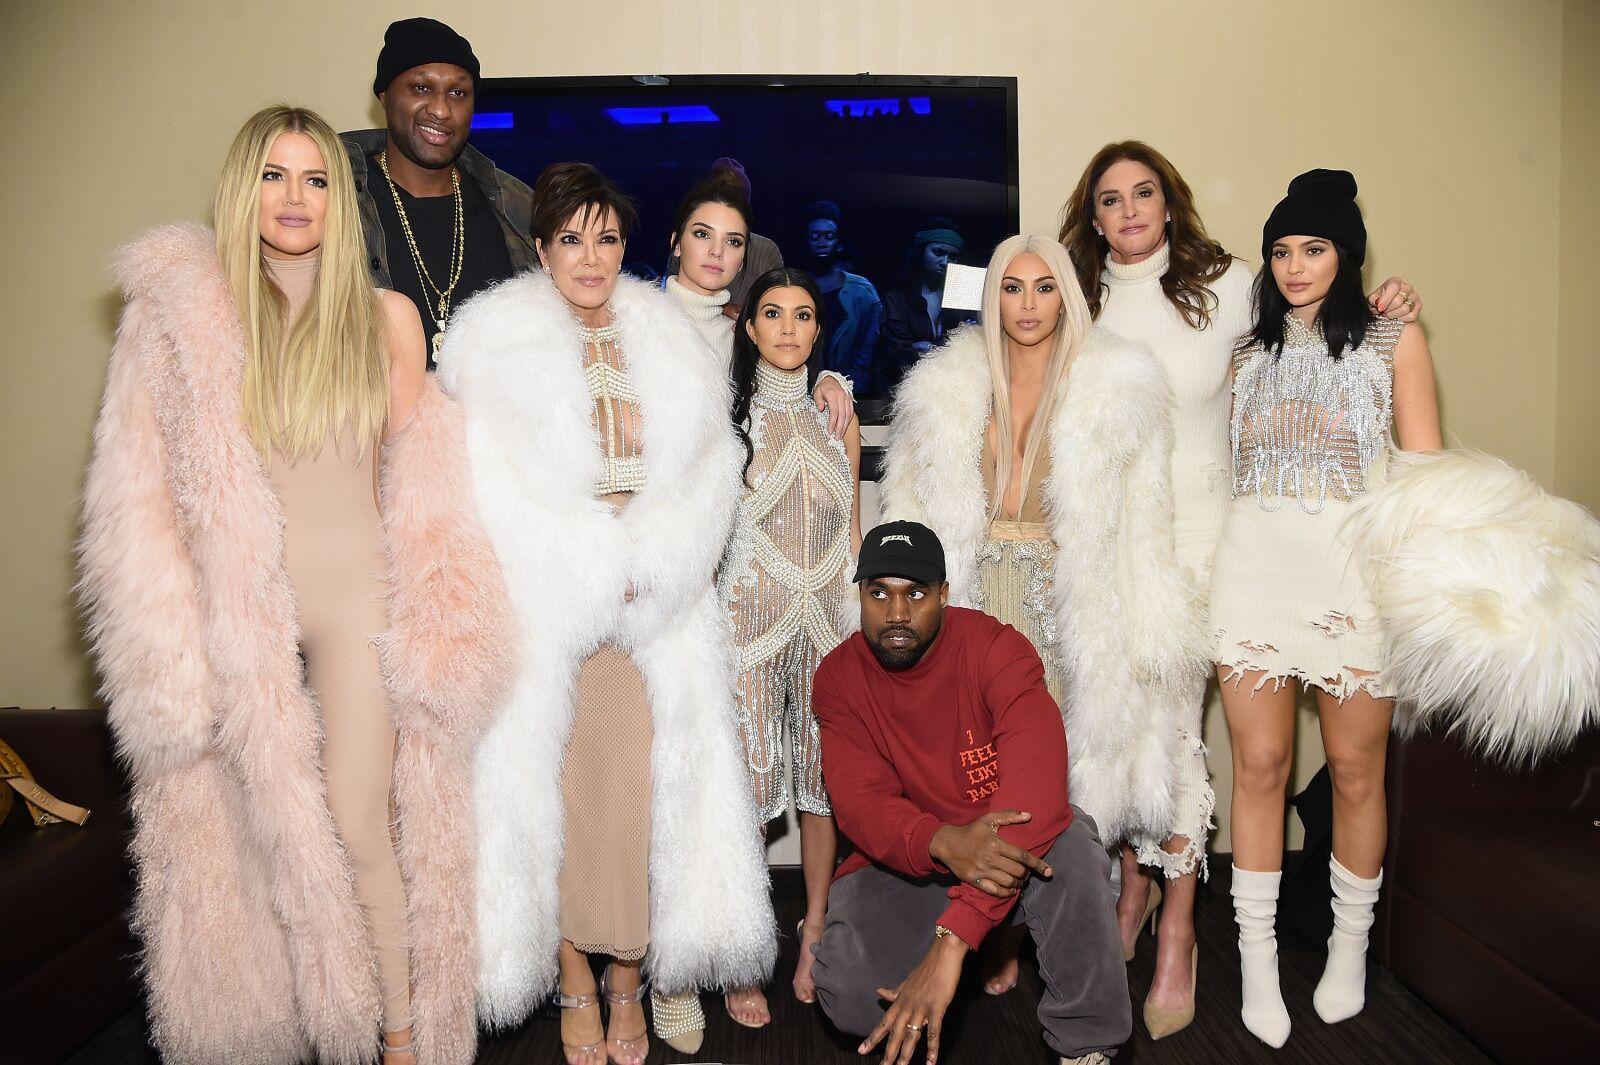 Kim Kardashian, Kanye West: Feud or friends with Caitlyn Jenner?